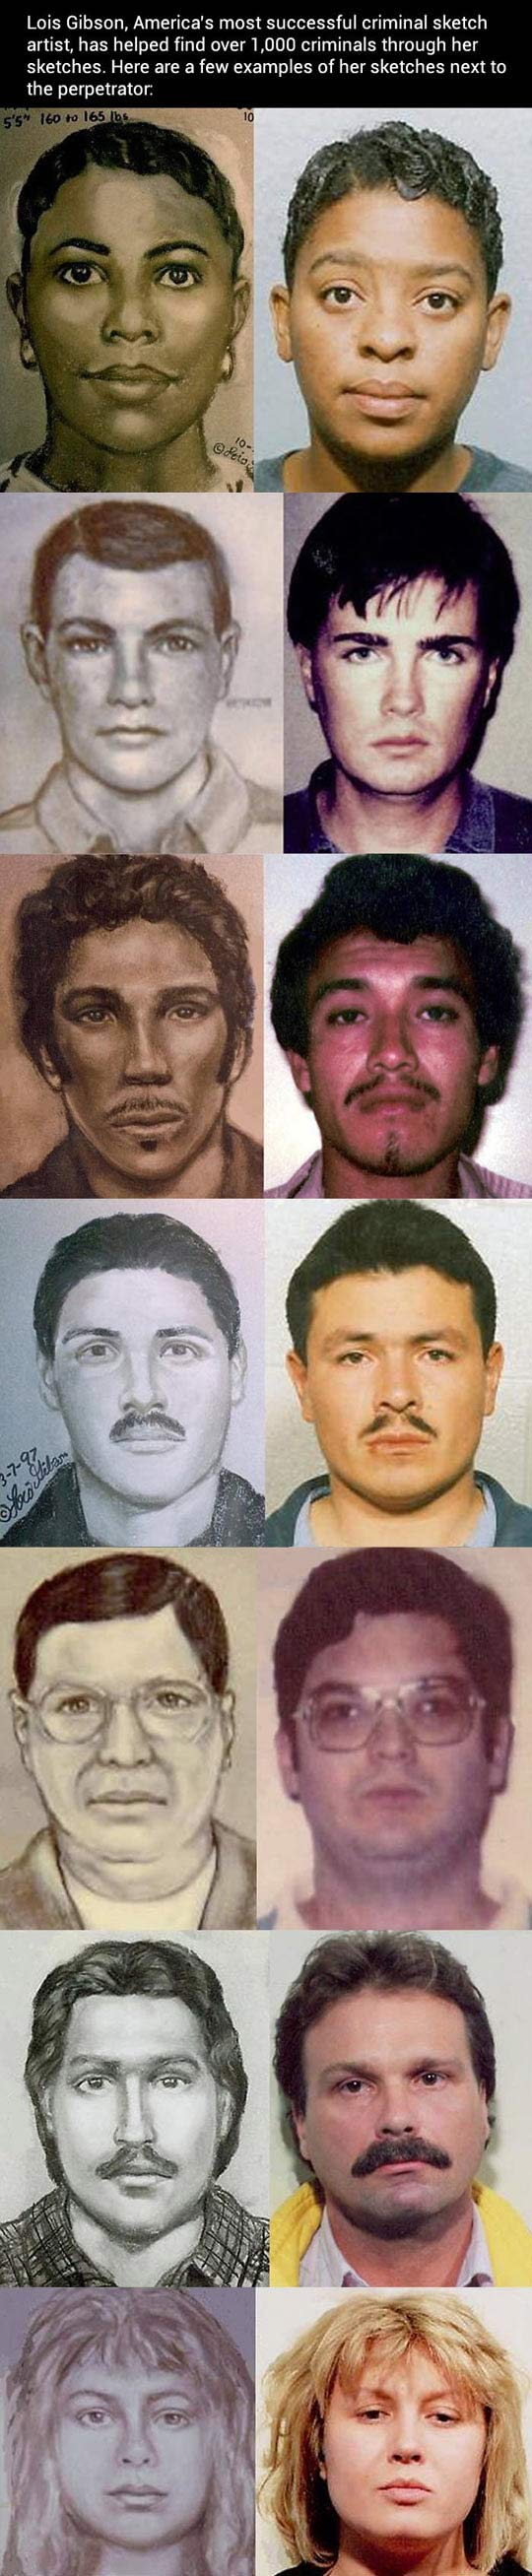 America S Most Successful Criminal Sketch Artist Sketches